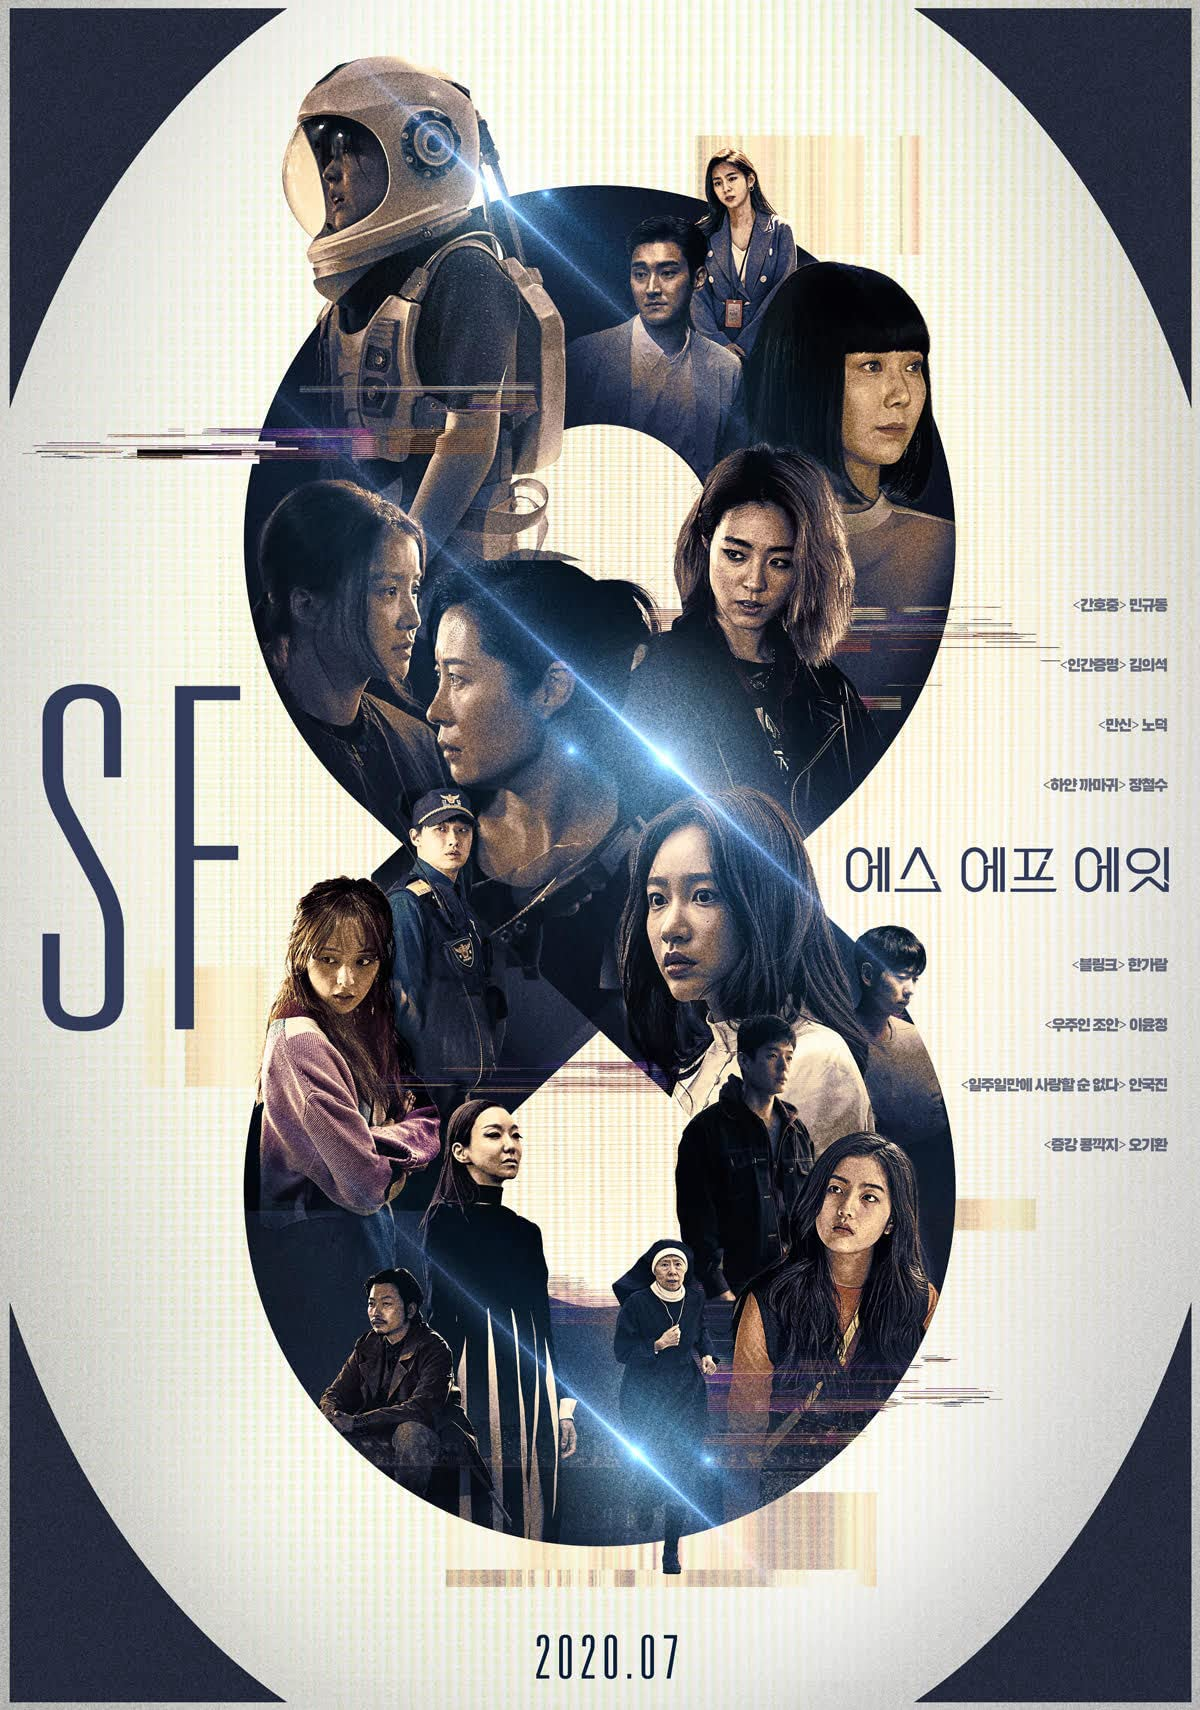 SF8 (2021) Season 1 Hindi Dubbed MX Player Original